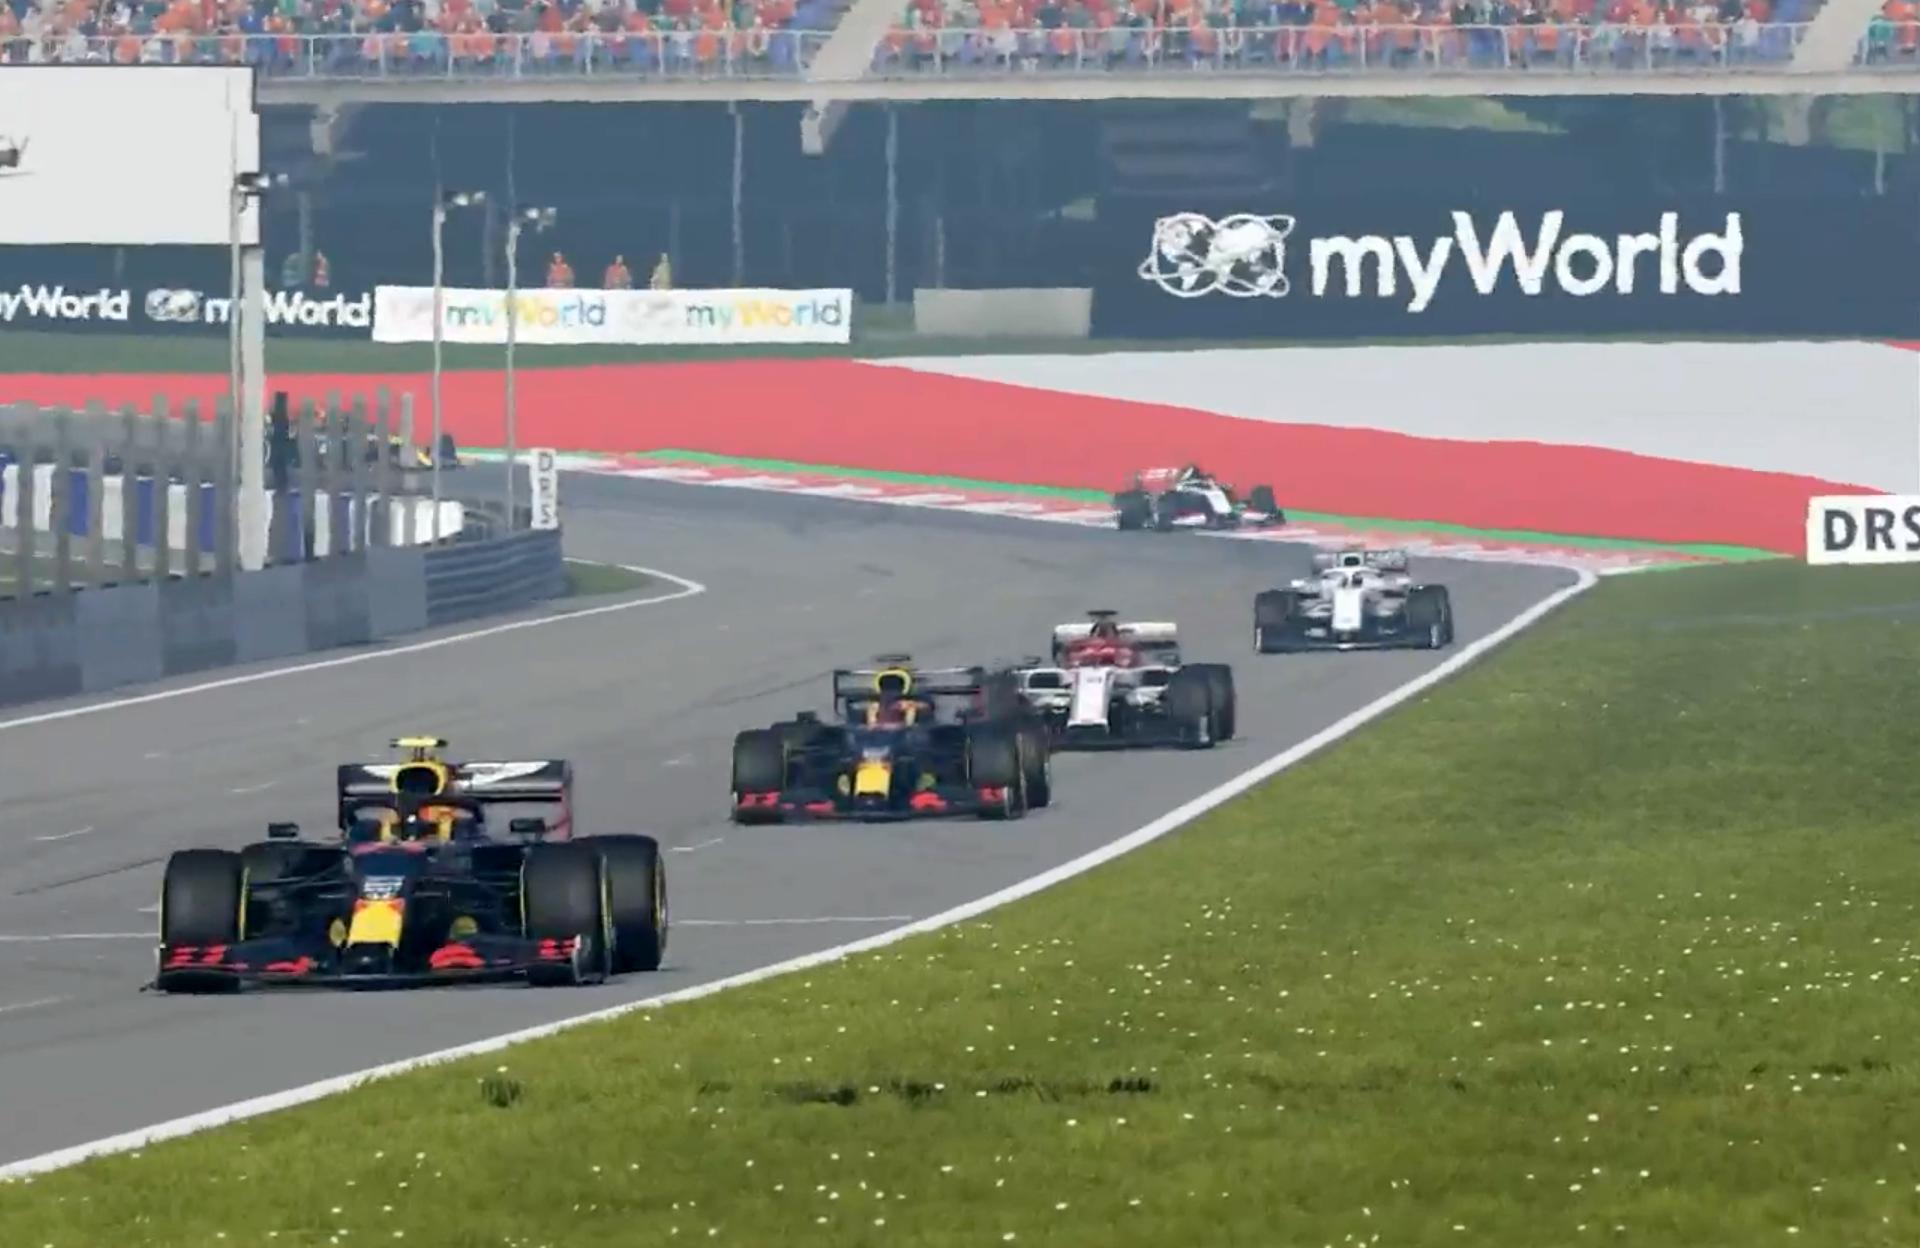 F1 Esports Austria Red Bull 1 2 Pic 1